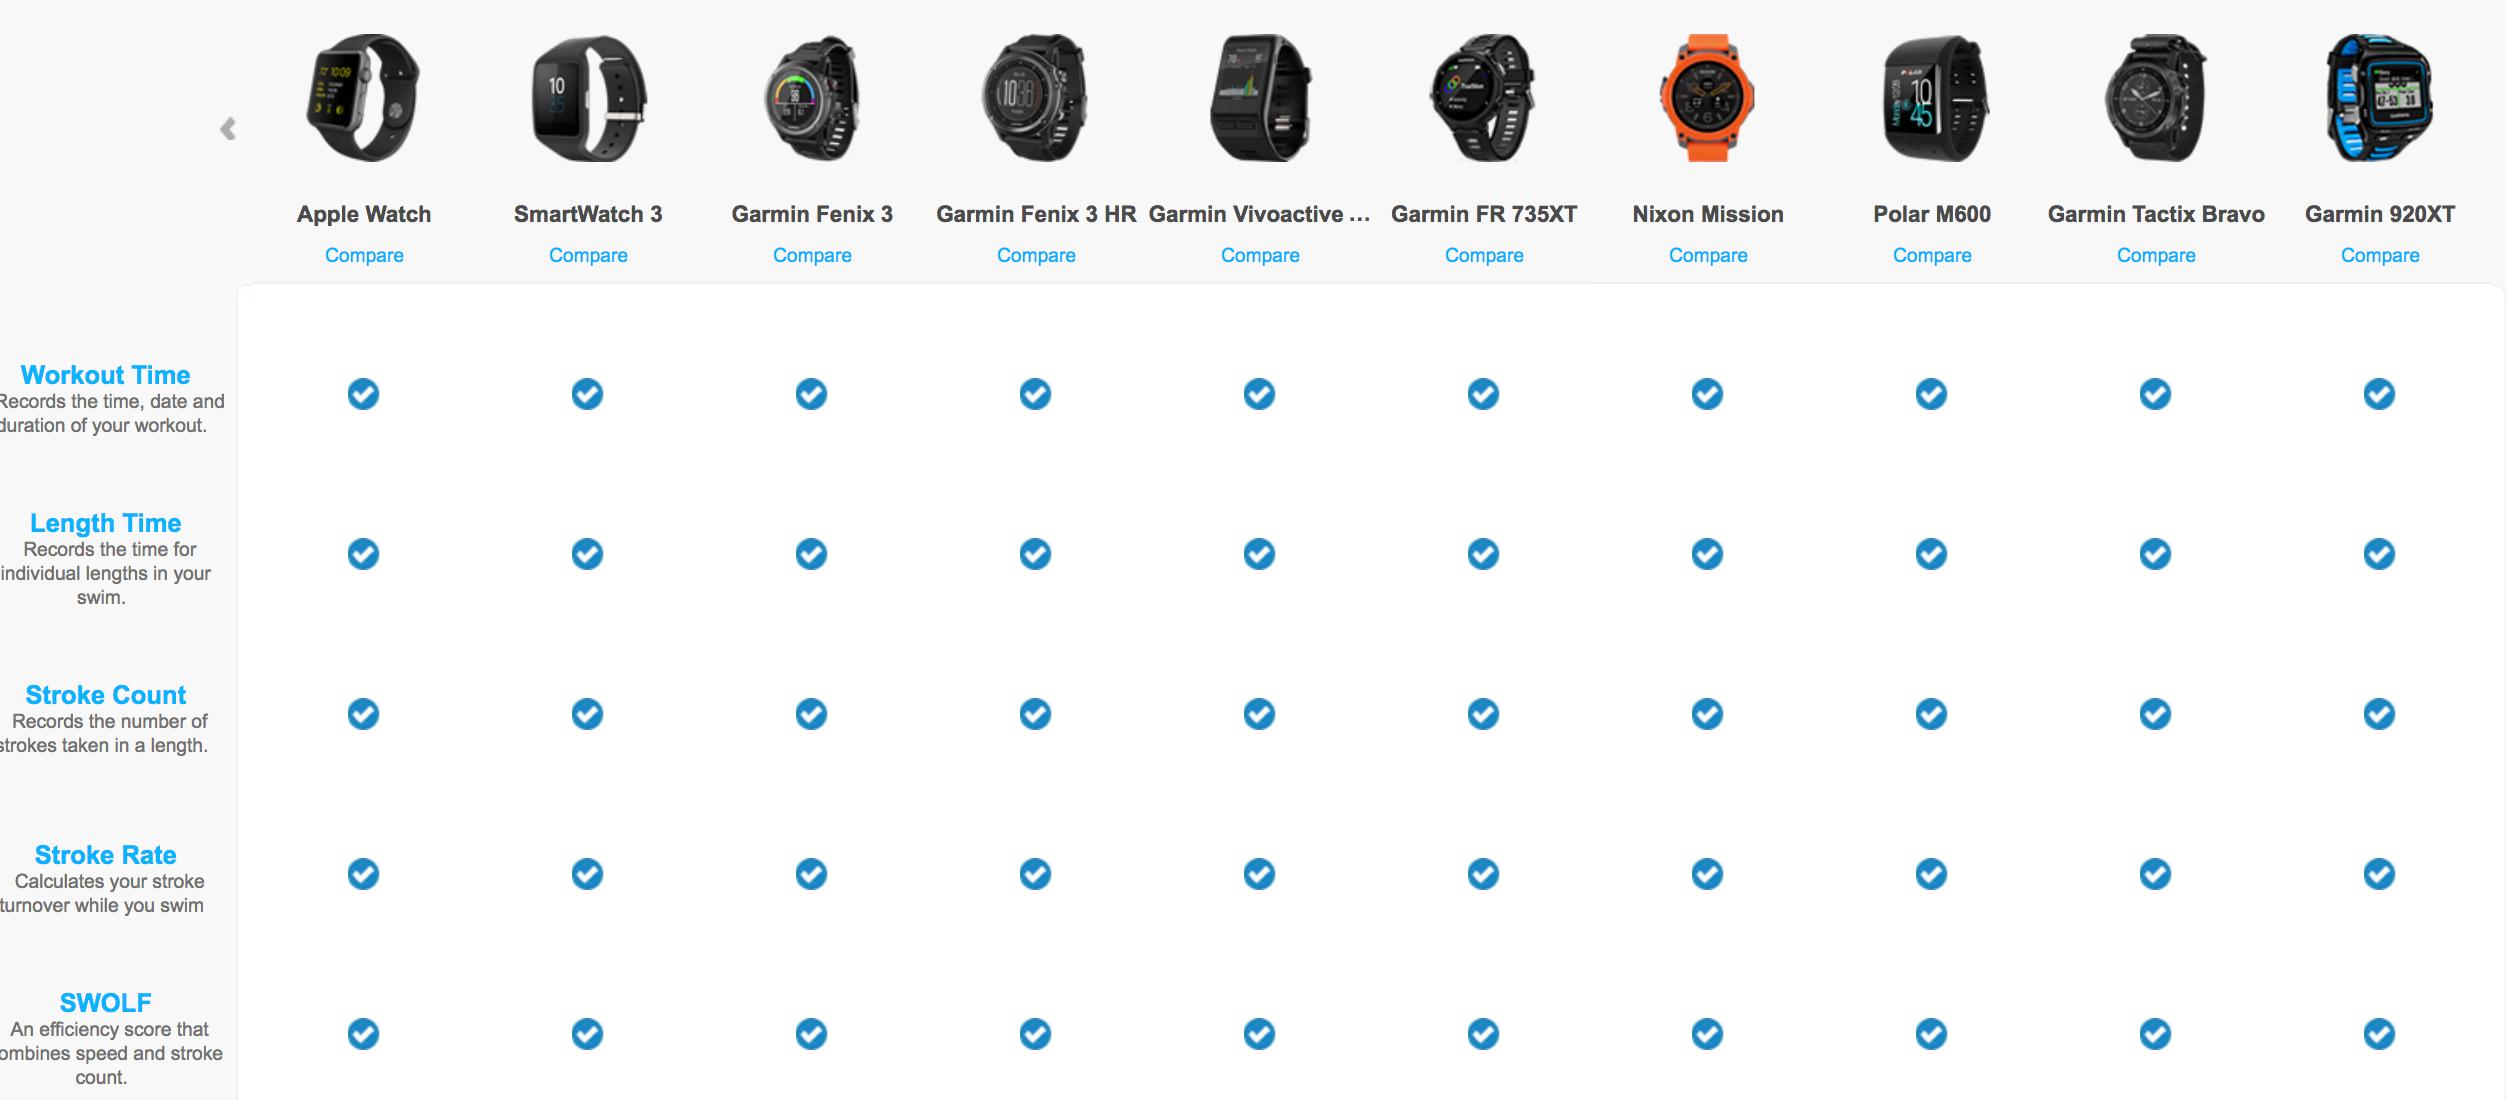 Swim Watches that work with the swim.com app